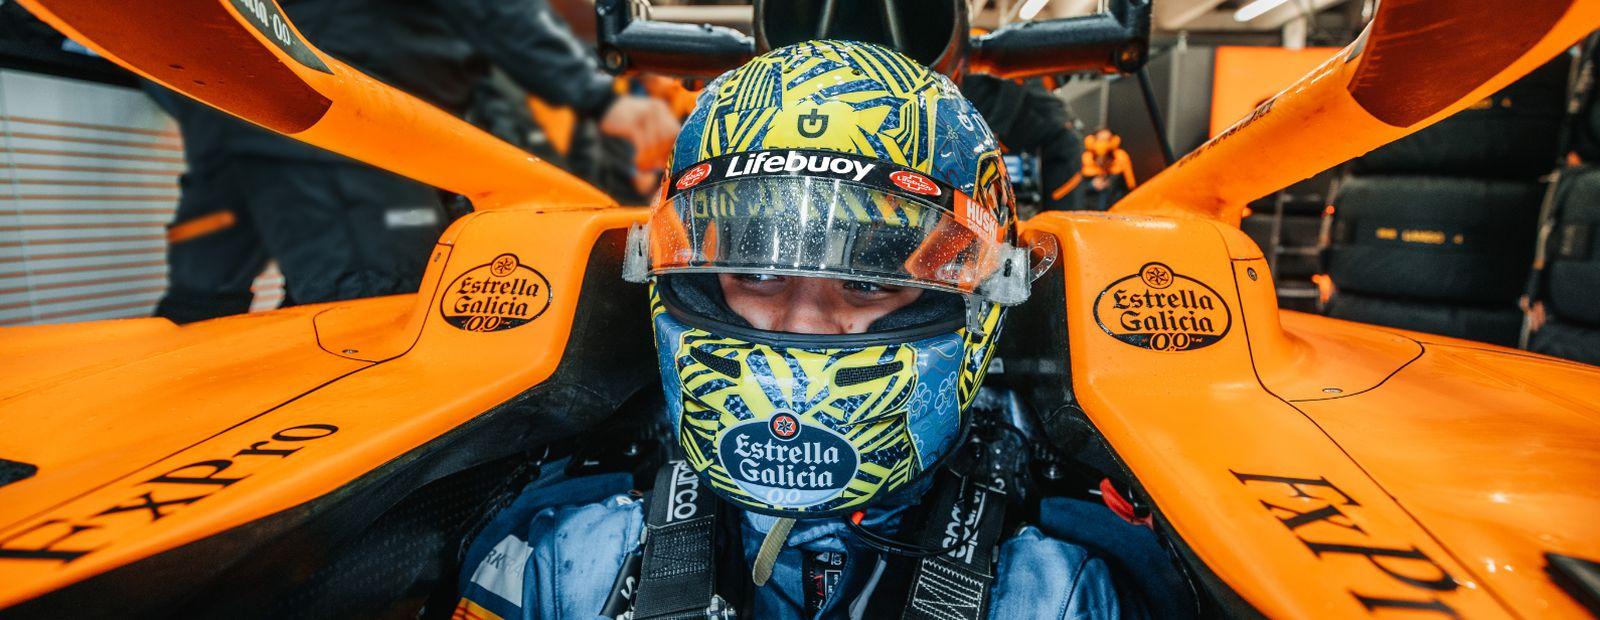 McLaren Racing announces Lifebuoy as Official Hygiene Supplier